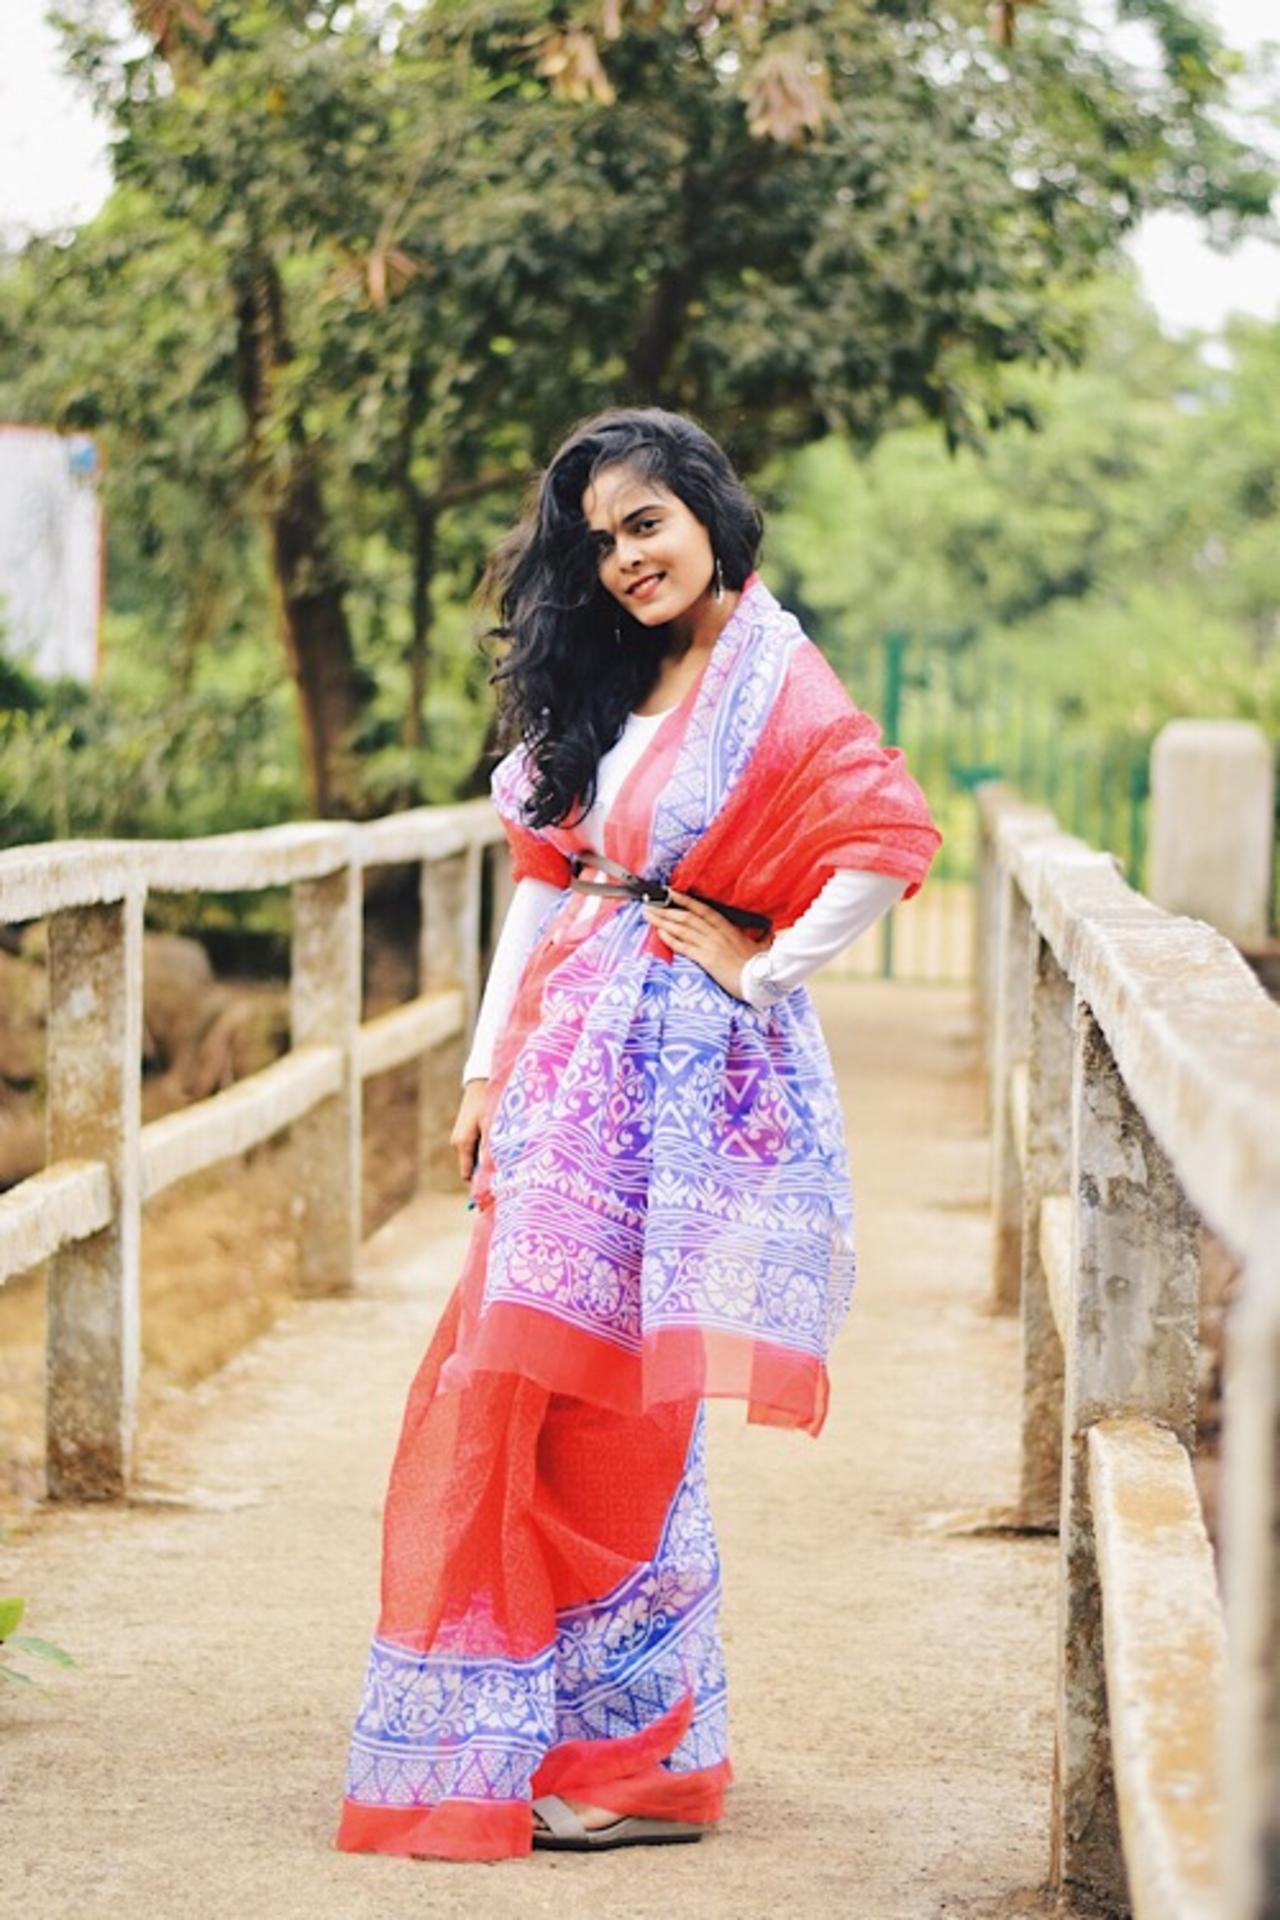 THE GLAM NUT - Fashion & Lifestyle Blog - EC22A8B3-C69B-4277-8150-B3B34156AE34